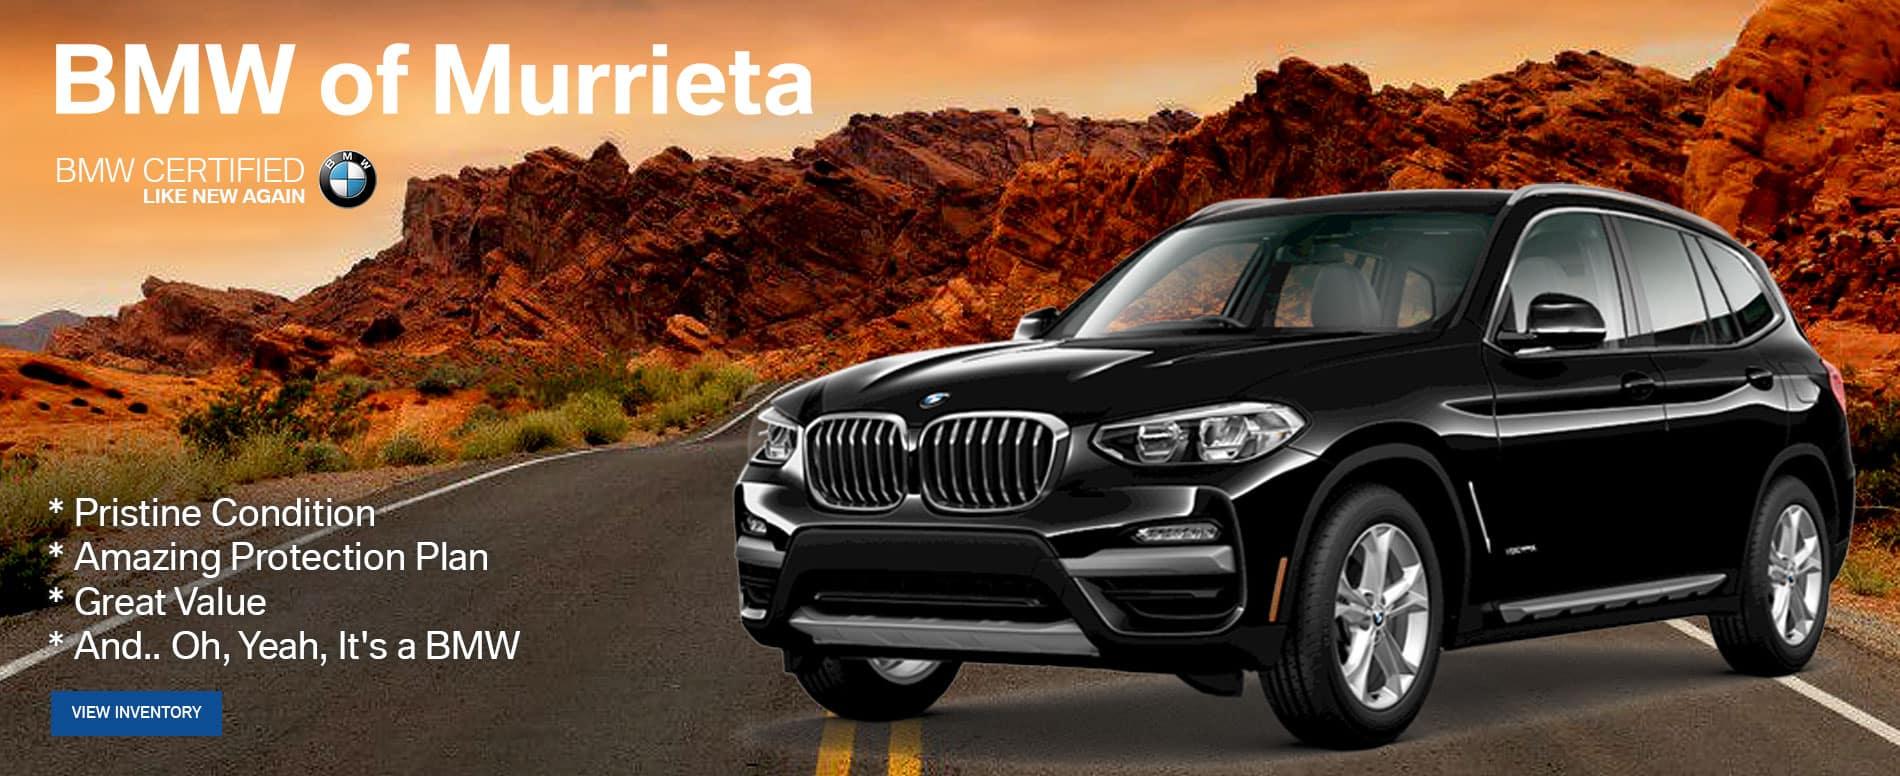 BMW-of-Murrieta-CPO